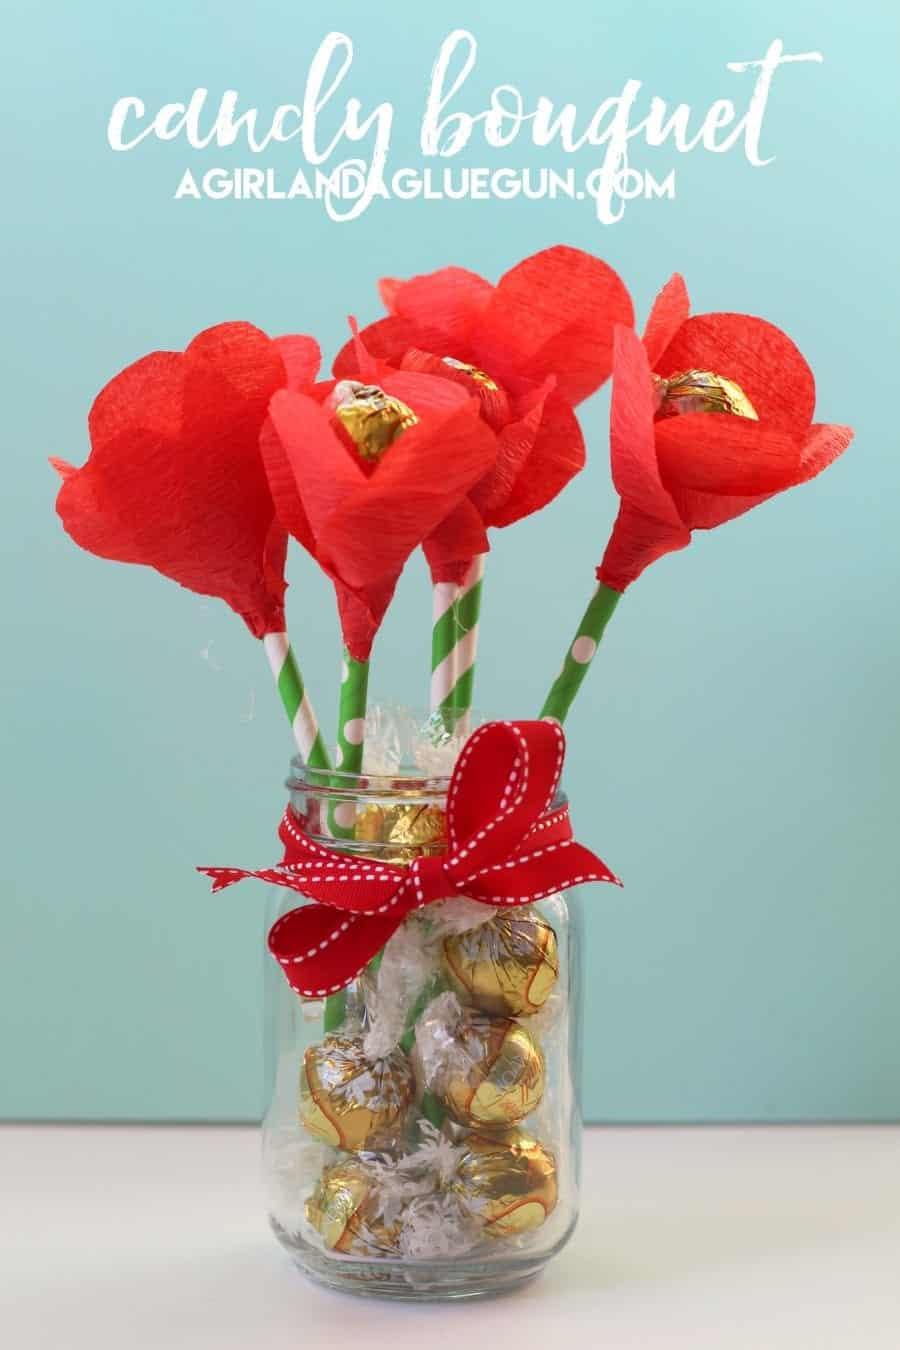 Candy flower bouquet a girl and a glue gun candy flower bouquet izmirmasajfo Choice Image